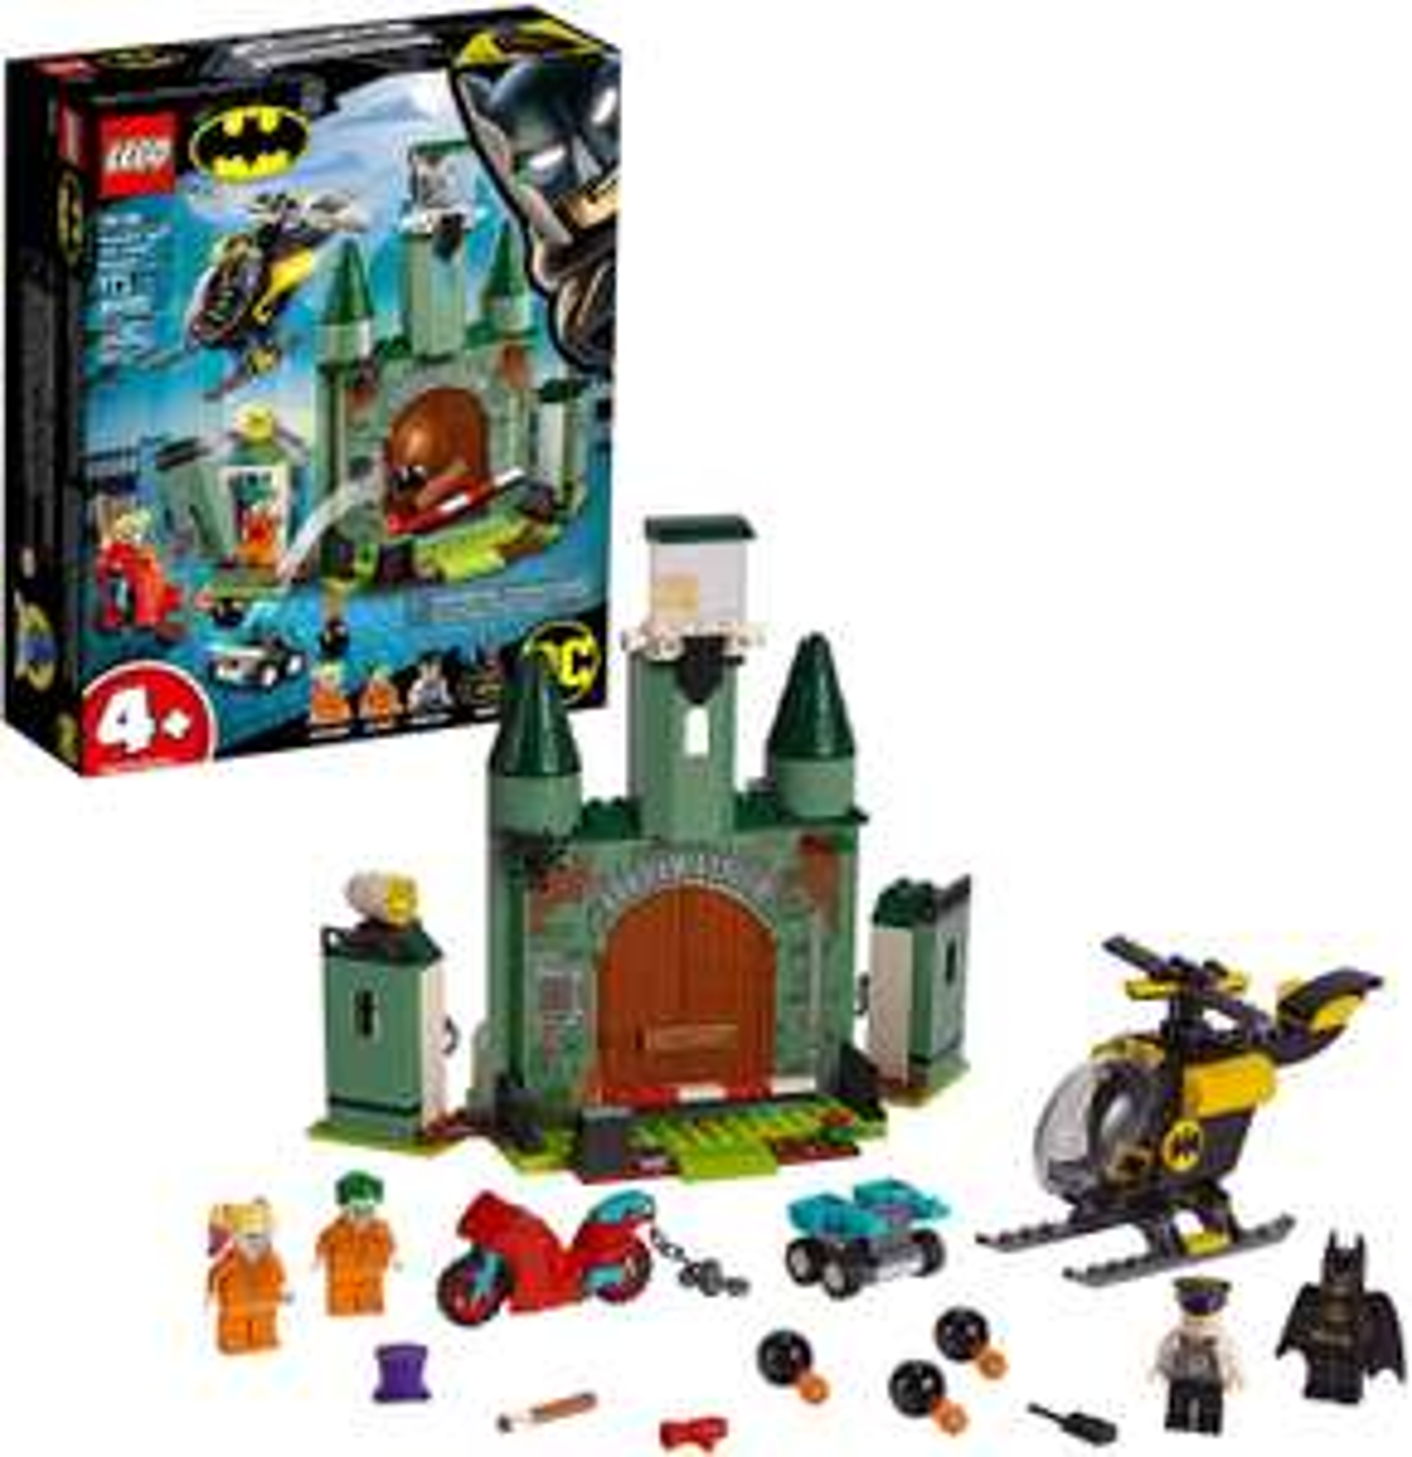 LEGO 76138 DC Batman 4+ Batman and The Joker Escape £17.50 instore @ Sainsbury's Darnley